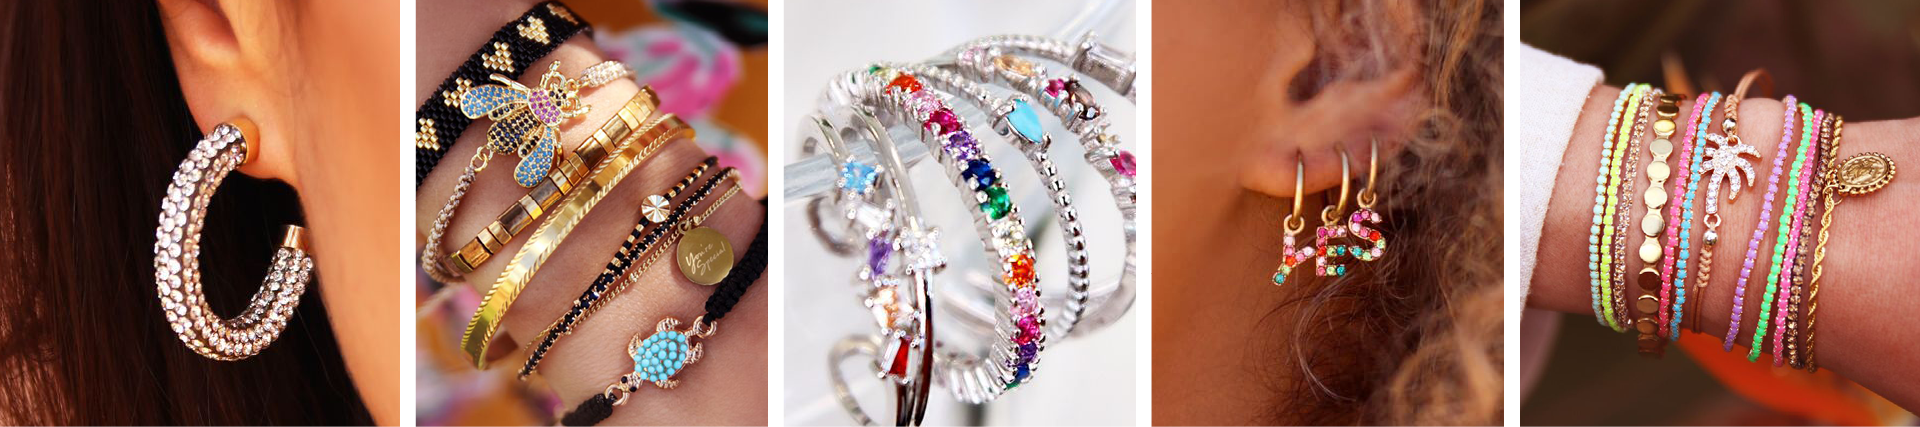 My Jewellery strass sieraden